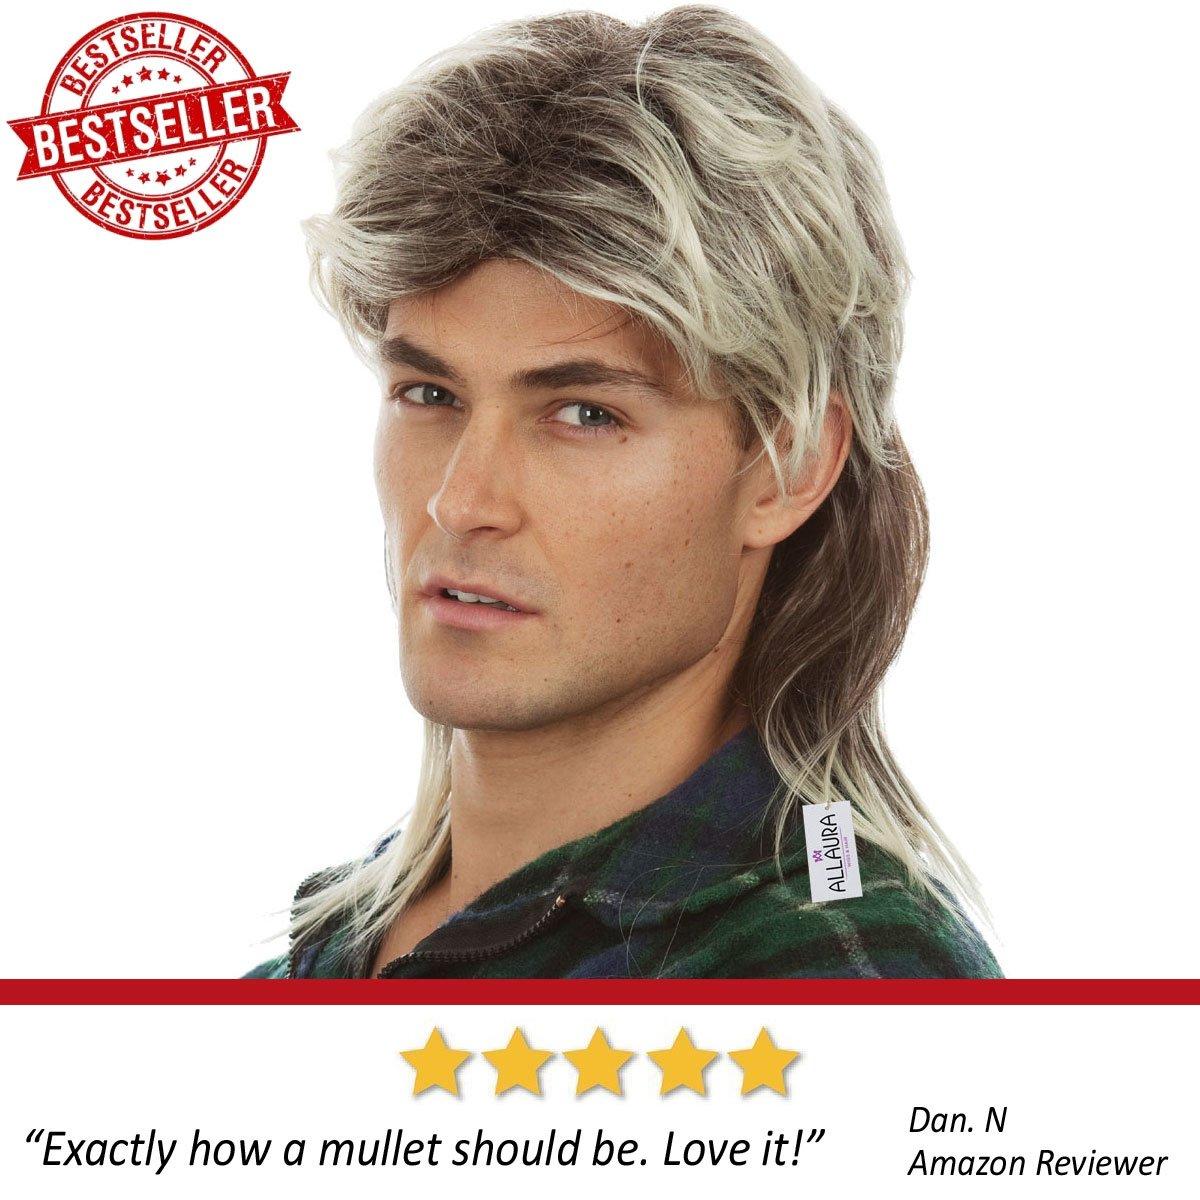 80s Blonde Mullet Wig for Men - Joe Dirt Wigs White Trash Redneck Costume by ALLAURA (Image #3)